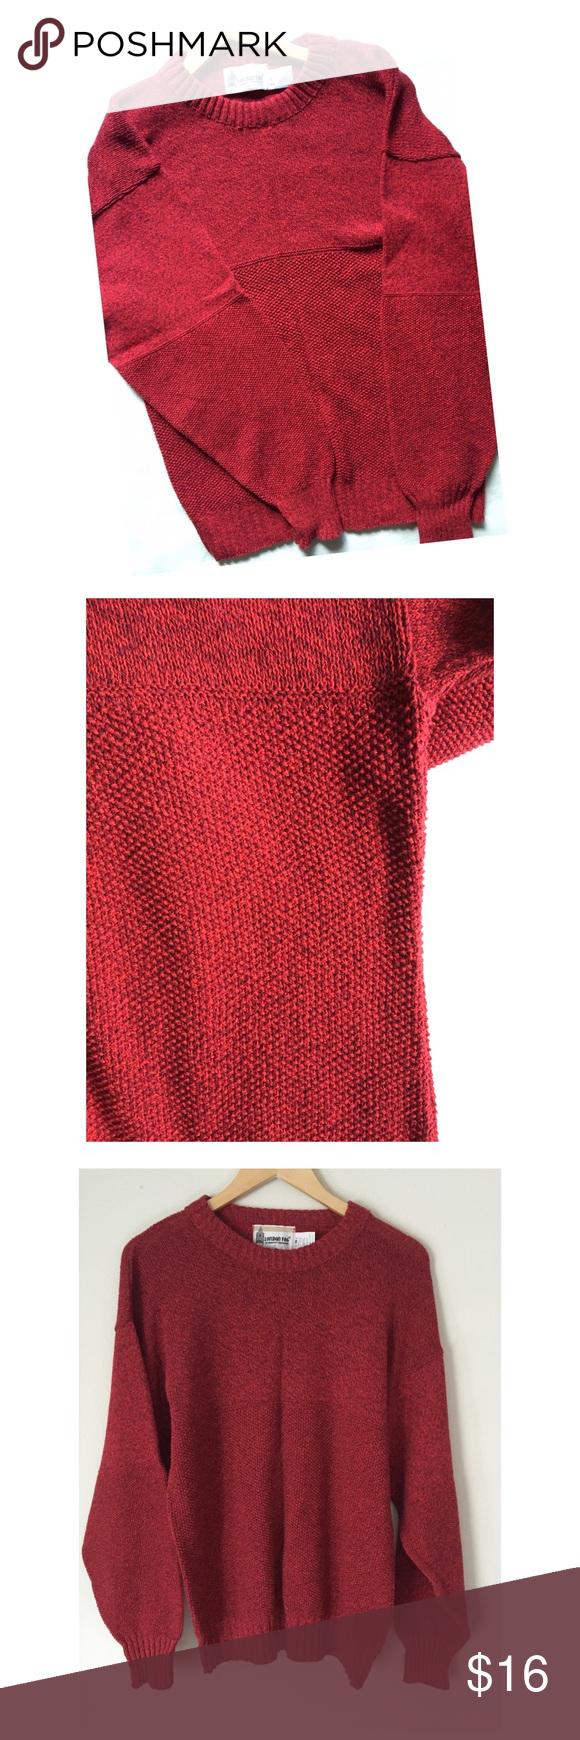 London Fog vintage red sweater⚡ Fab London Fog red vintage knit ...